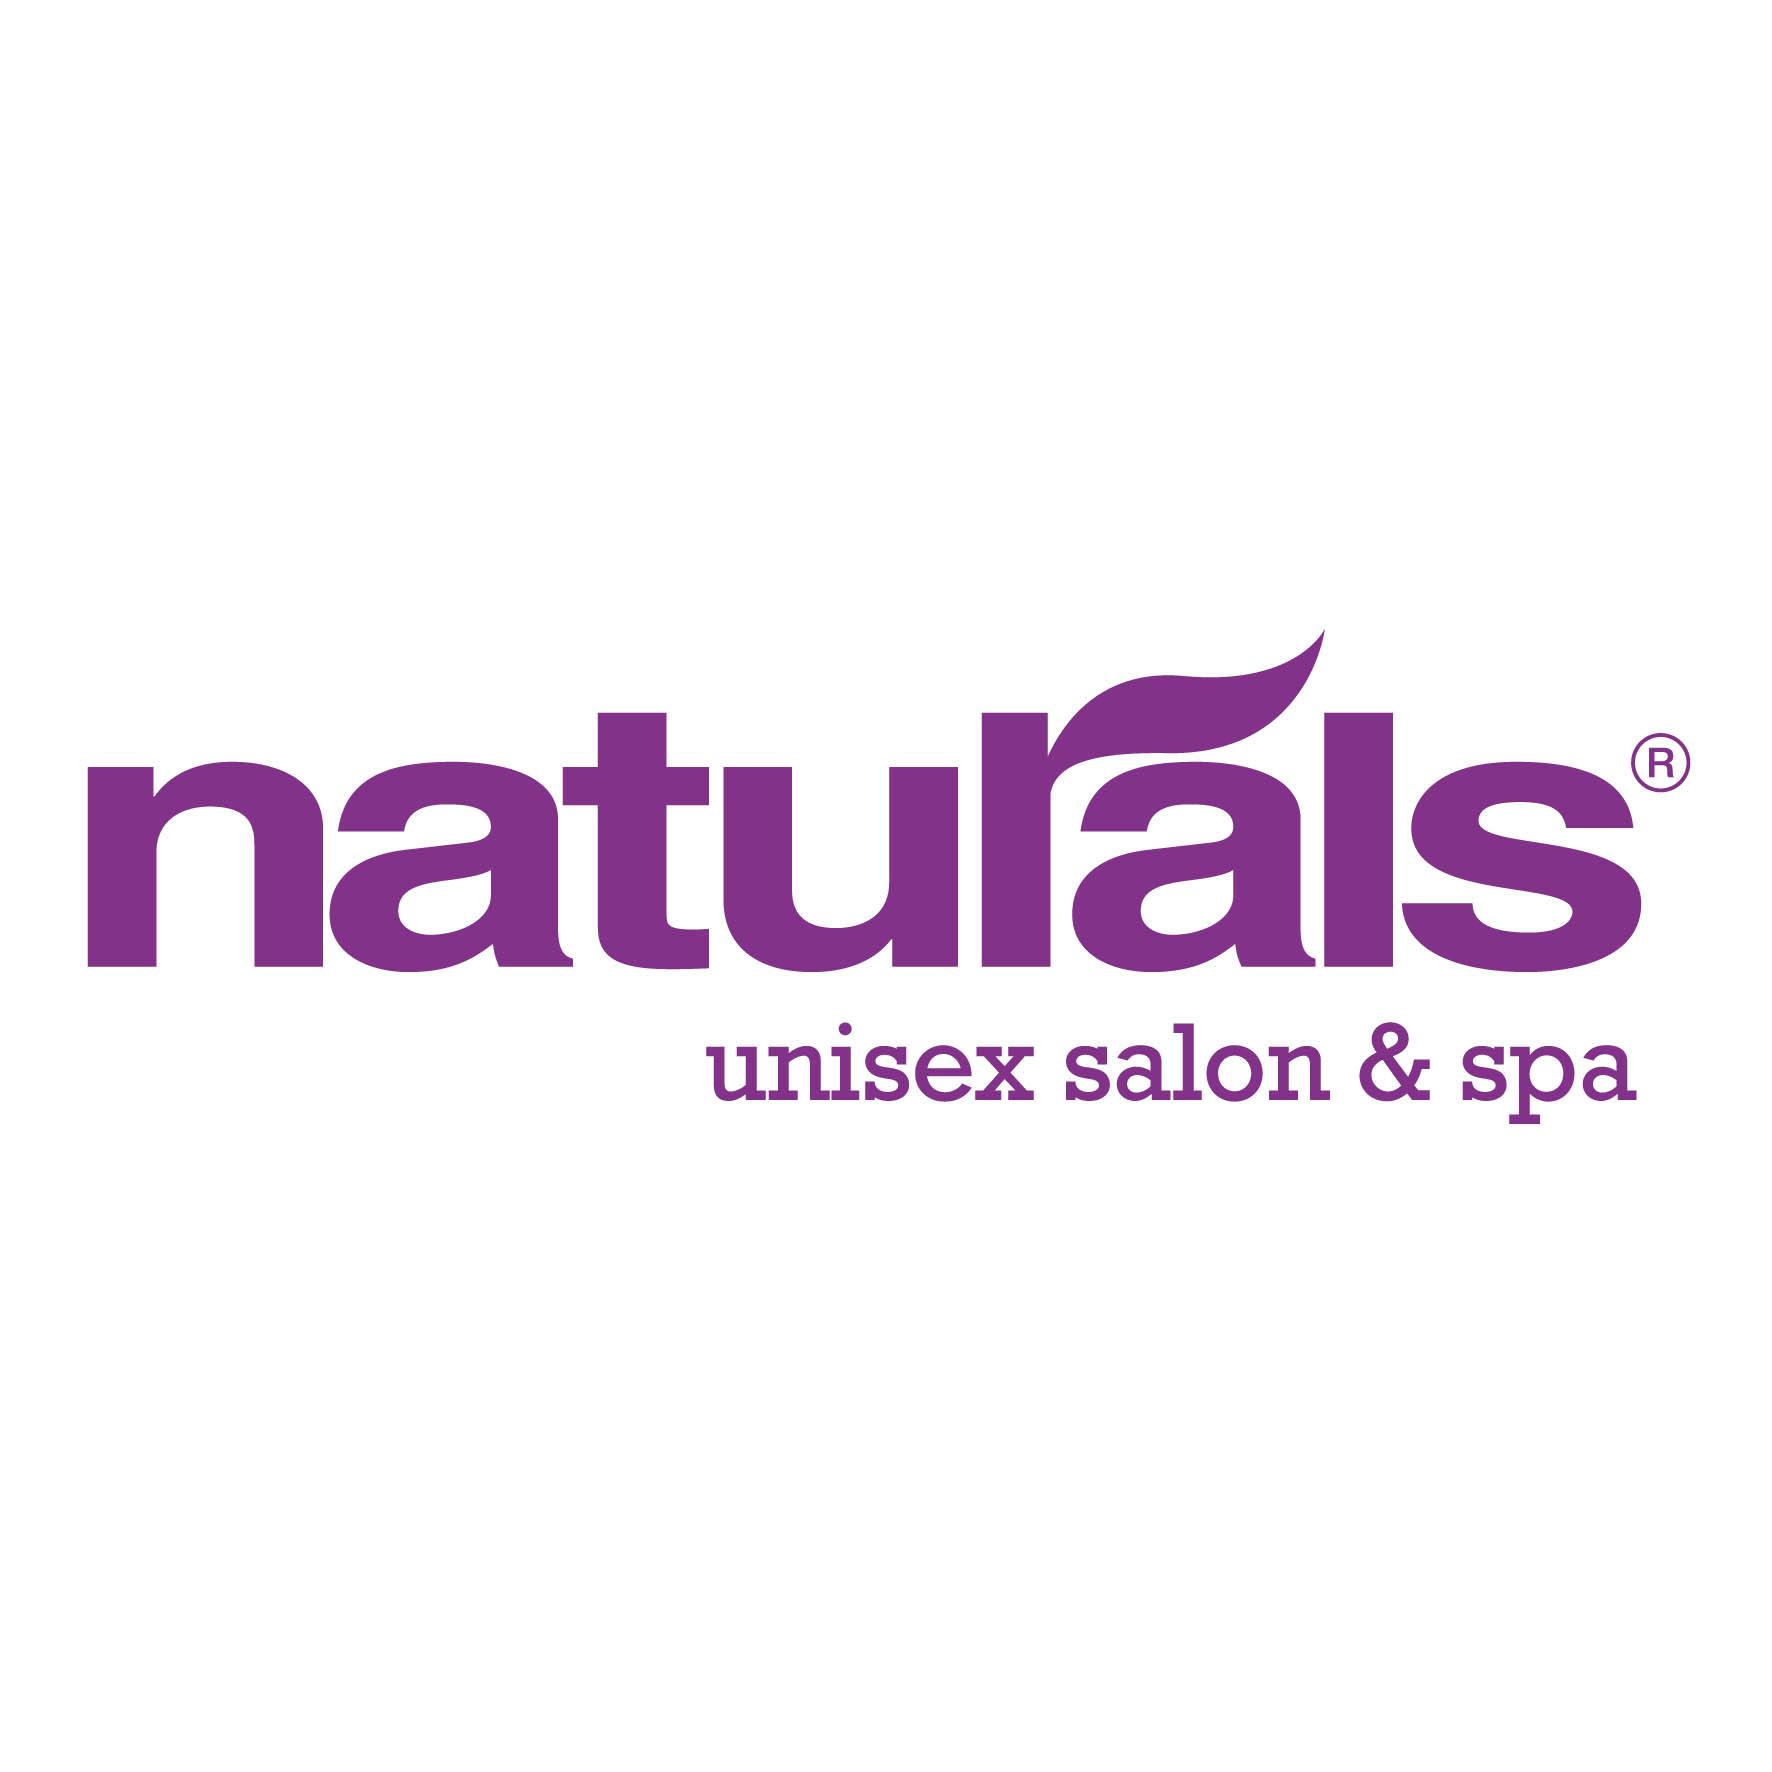 Naturals Unisex Salon | 9654955831 - logo